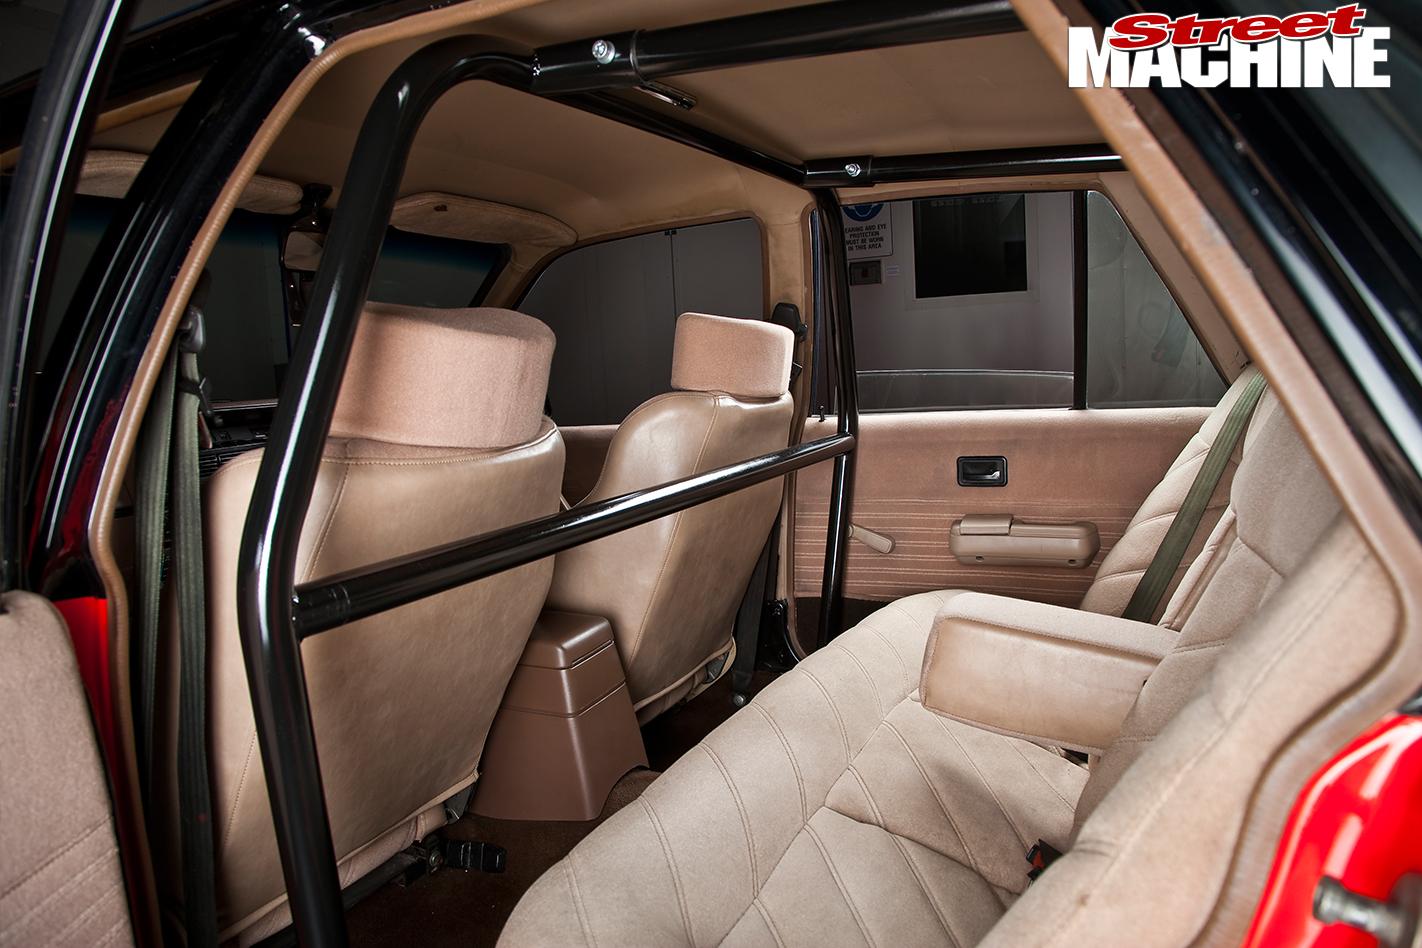 Holden -VK-Commodore -interior -rear